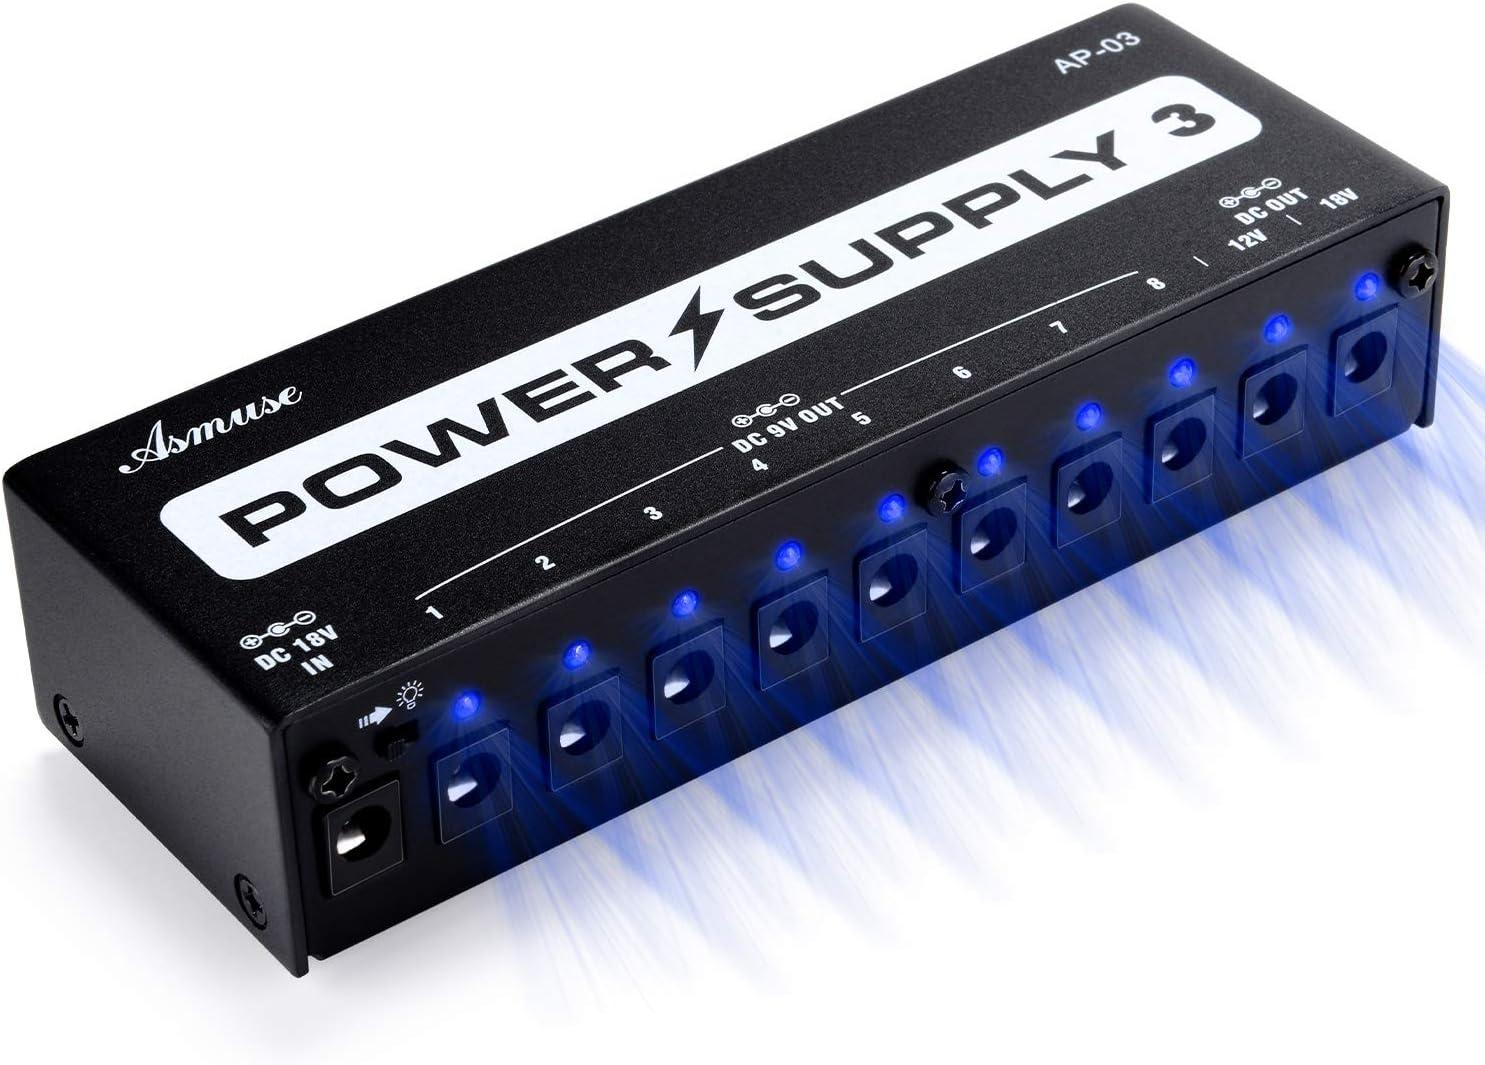 Fuente de alimentación para pedal de guitarra, 10 salidas de CC aisladas (9 V / 12 V / 18 V) para pedales de efectos de bajo de guitarra con puerto de carga USB incorporado para usos múltiples